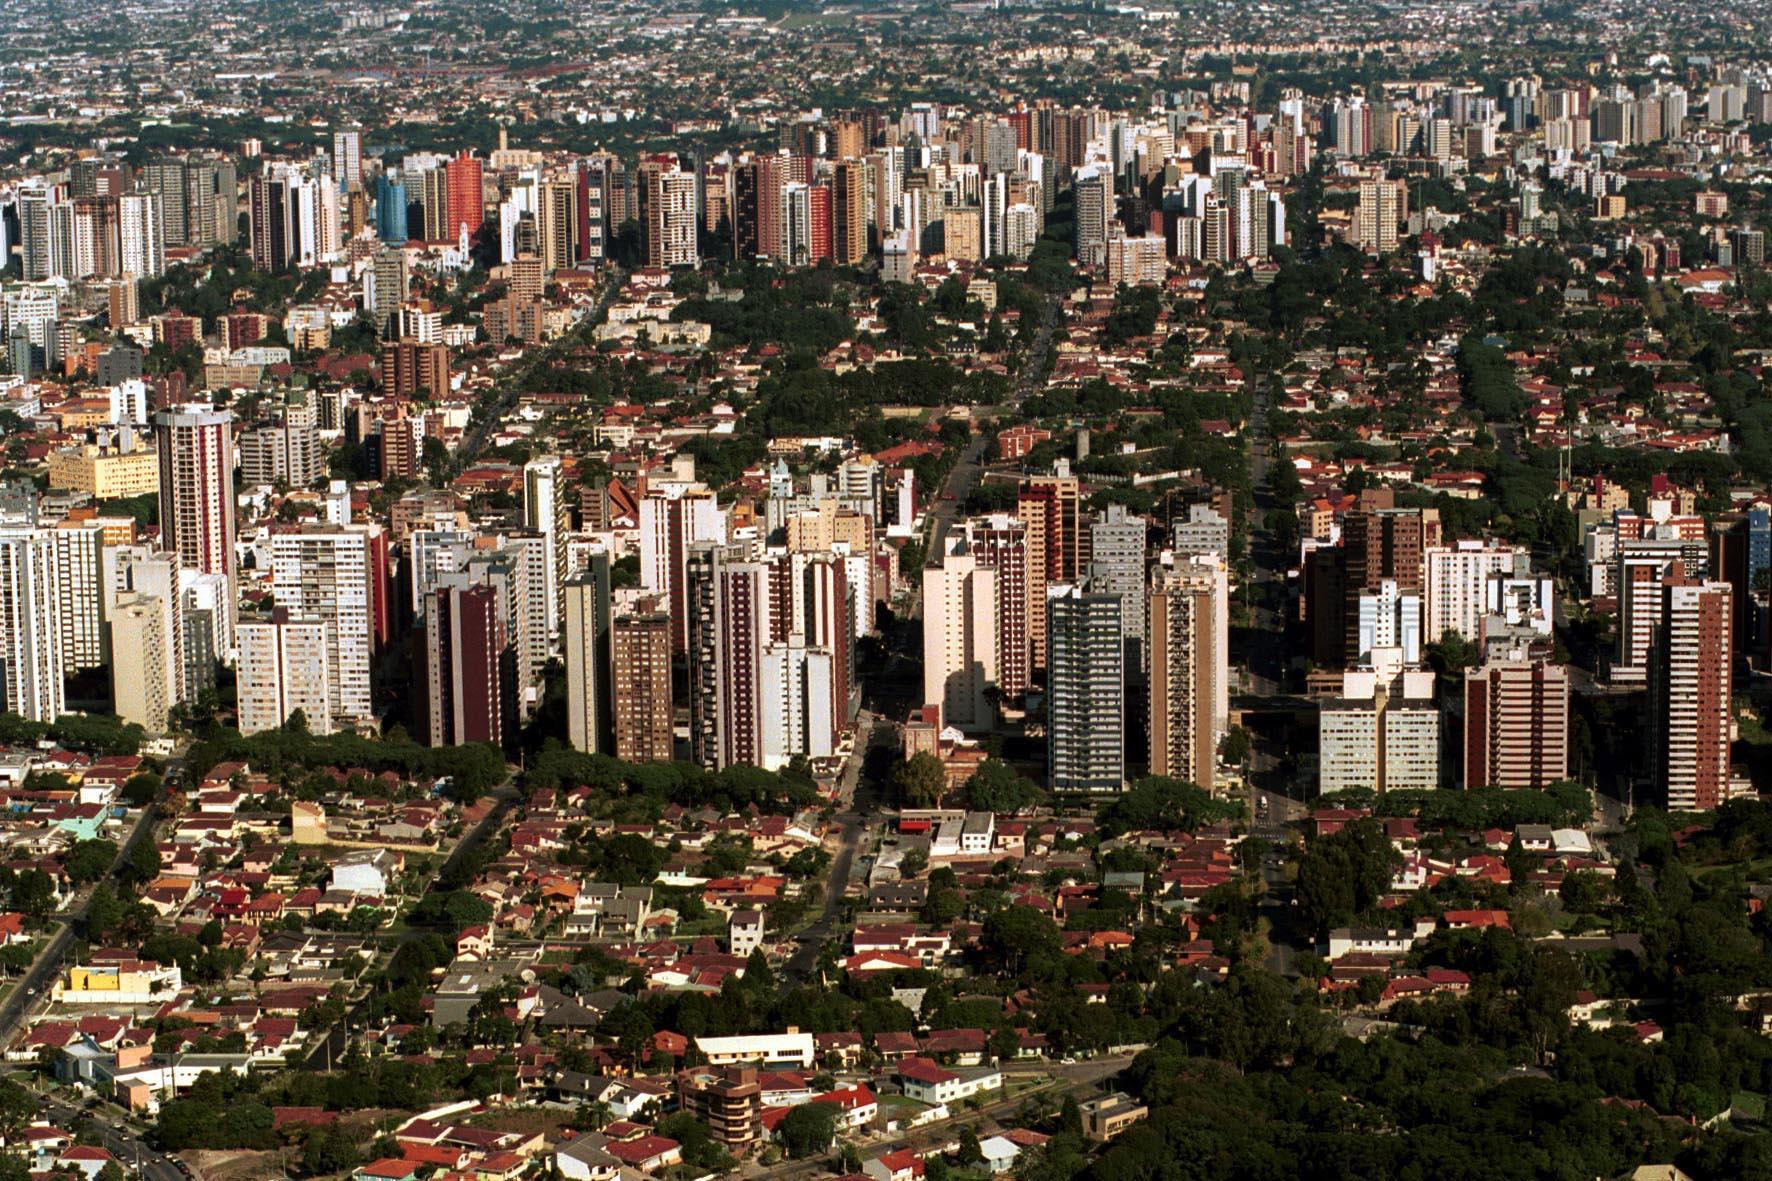 bairro bigorrilho_vista aérea.jpg